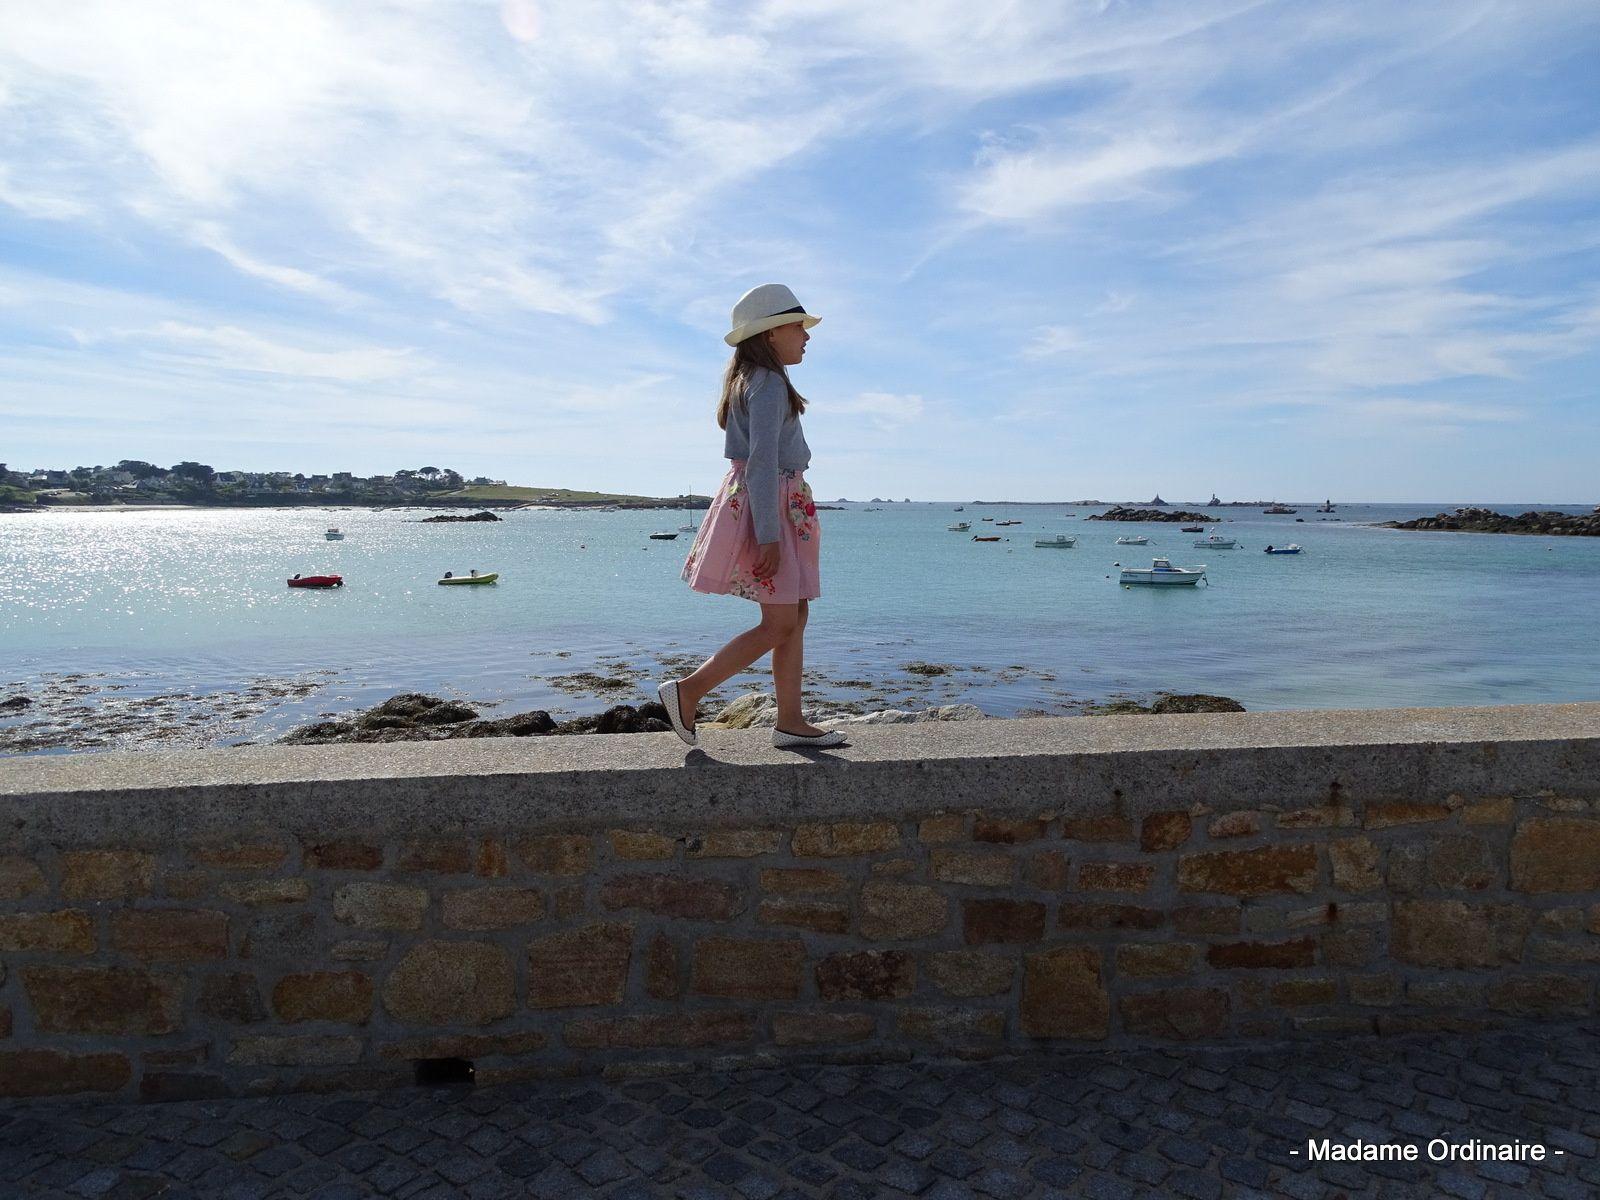 Balade estivale en Finistère #1